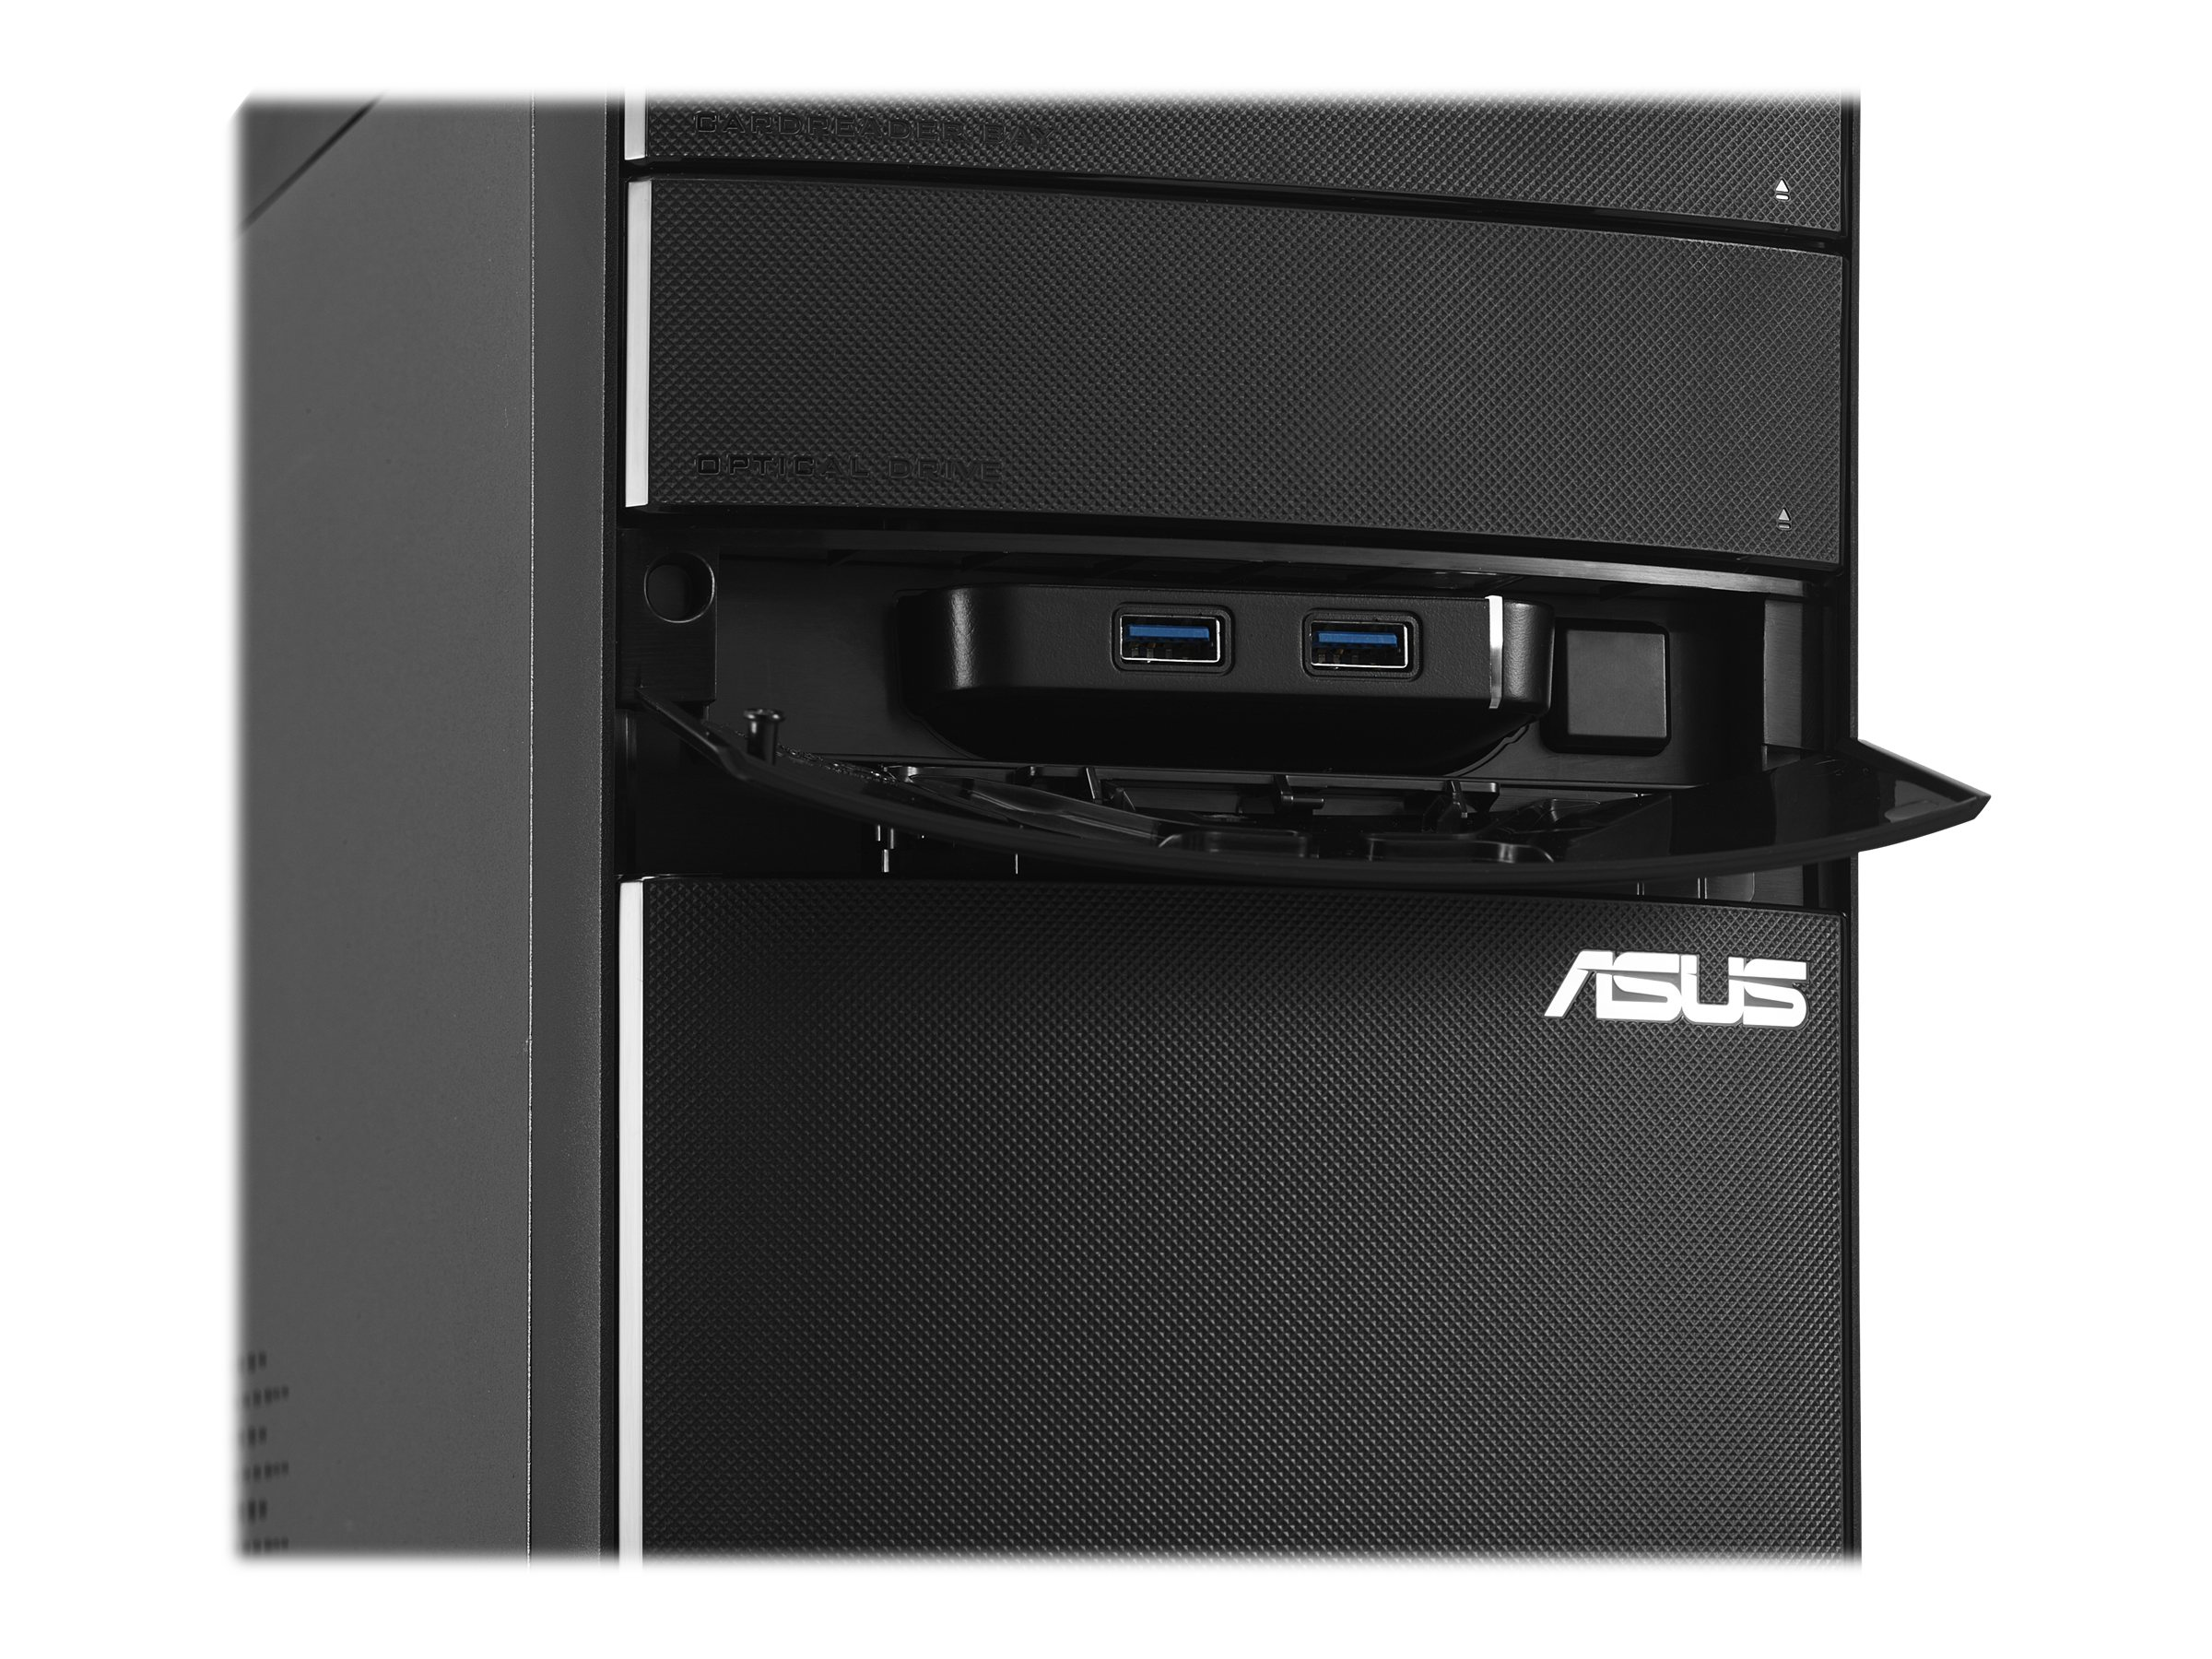 Asus M51AD-US002S Image 6